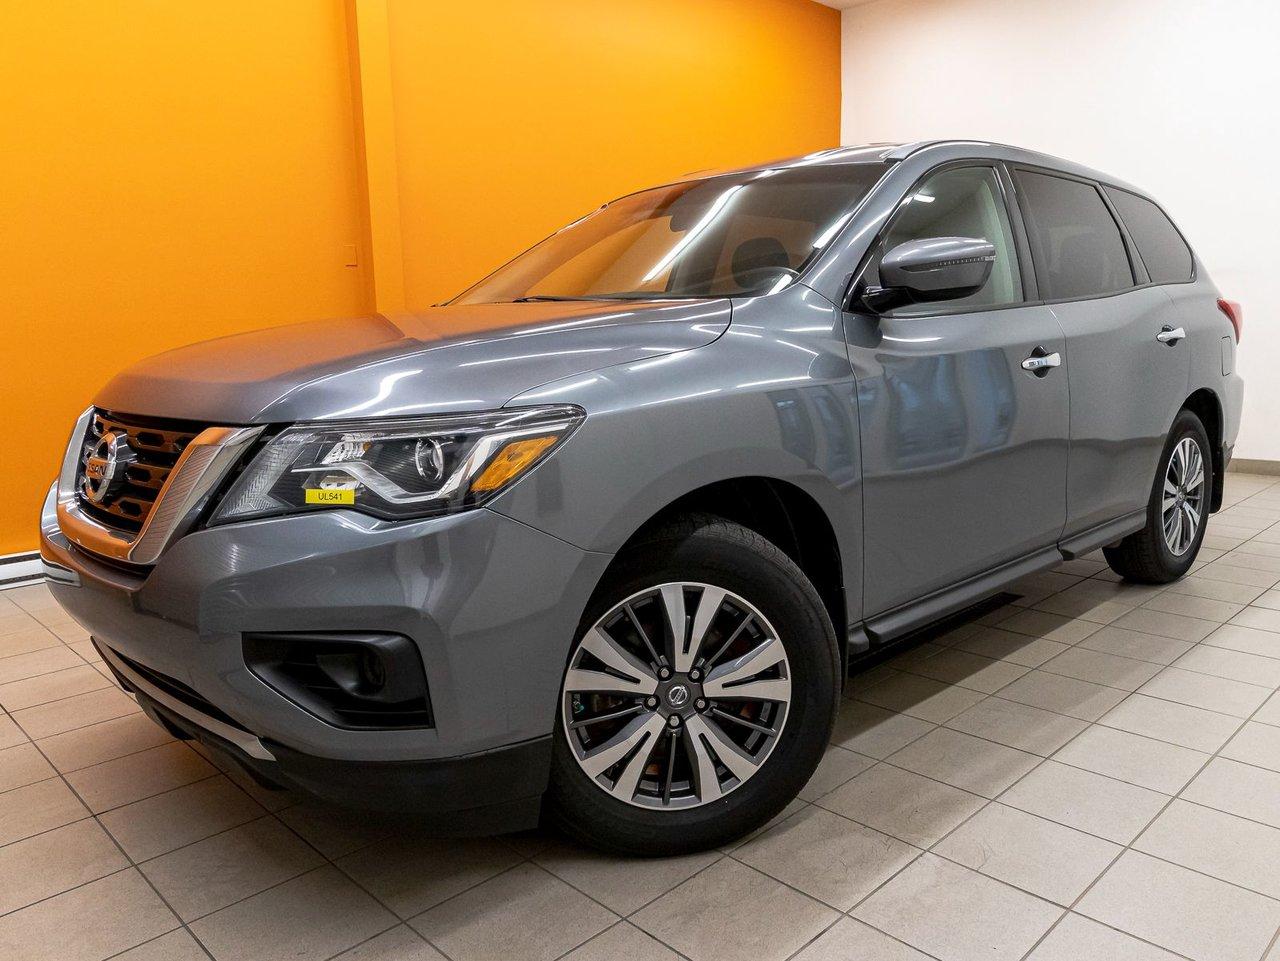 Nissan Pathfinder 2017 S 7 PLACES ÉCRAN TACT CAMÉRA CLIM MULTI *BAS